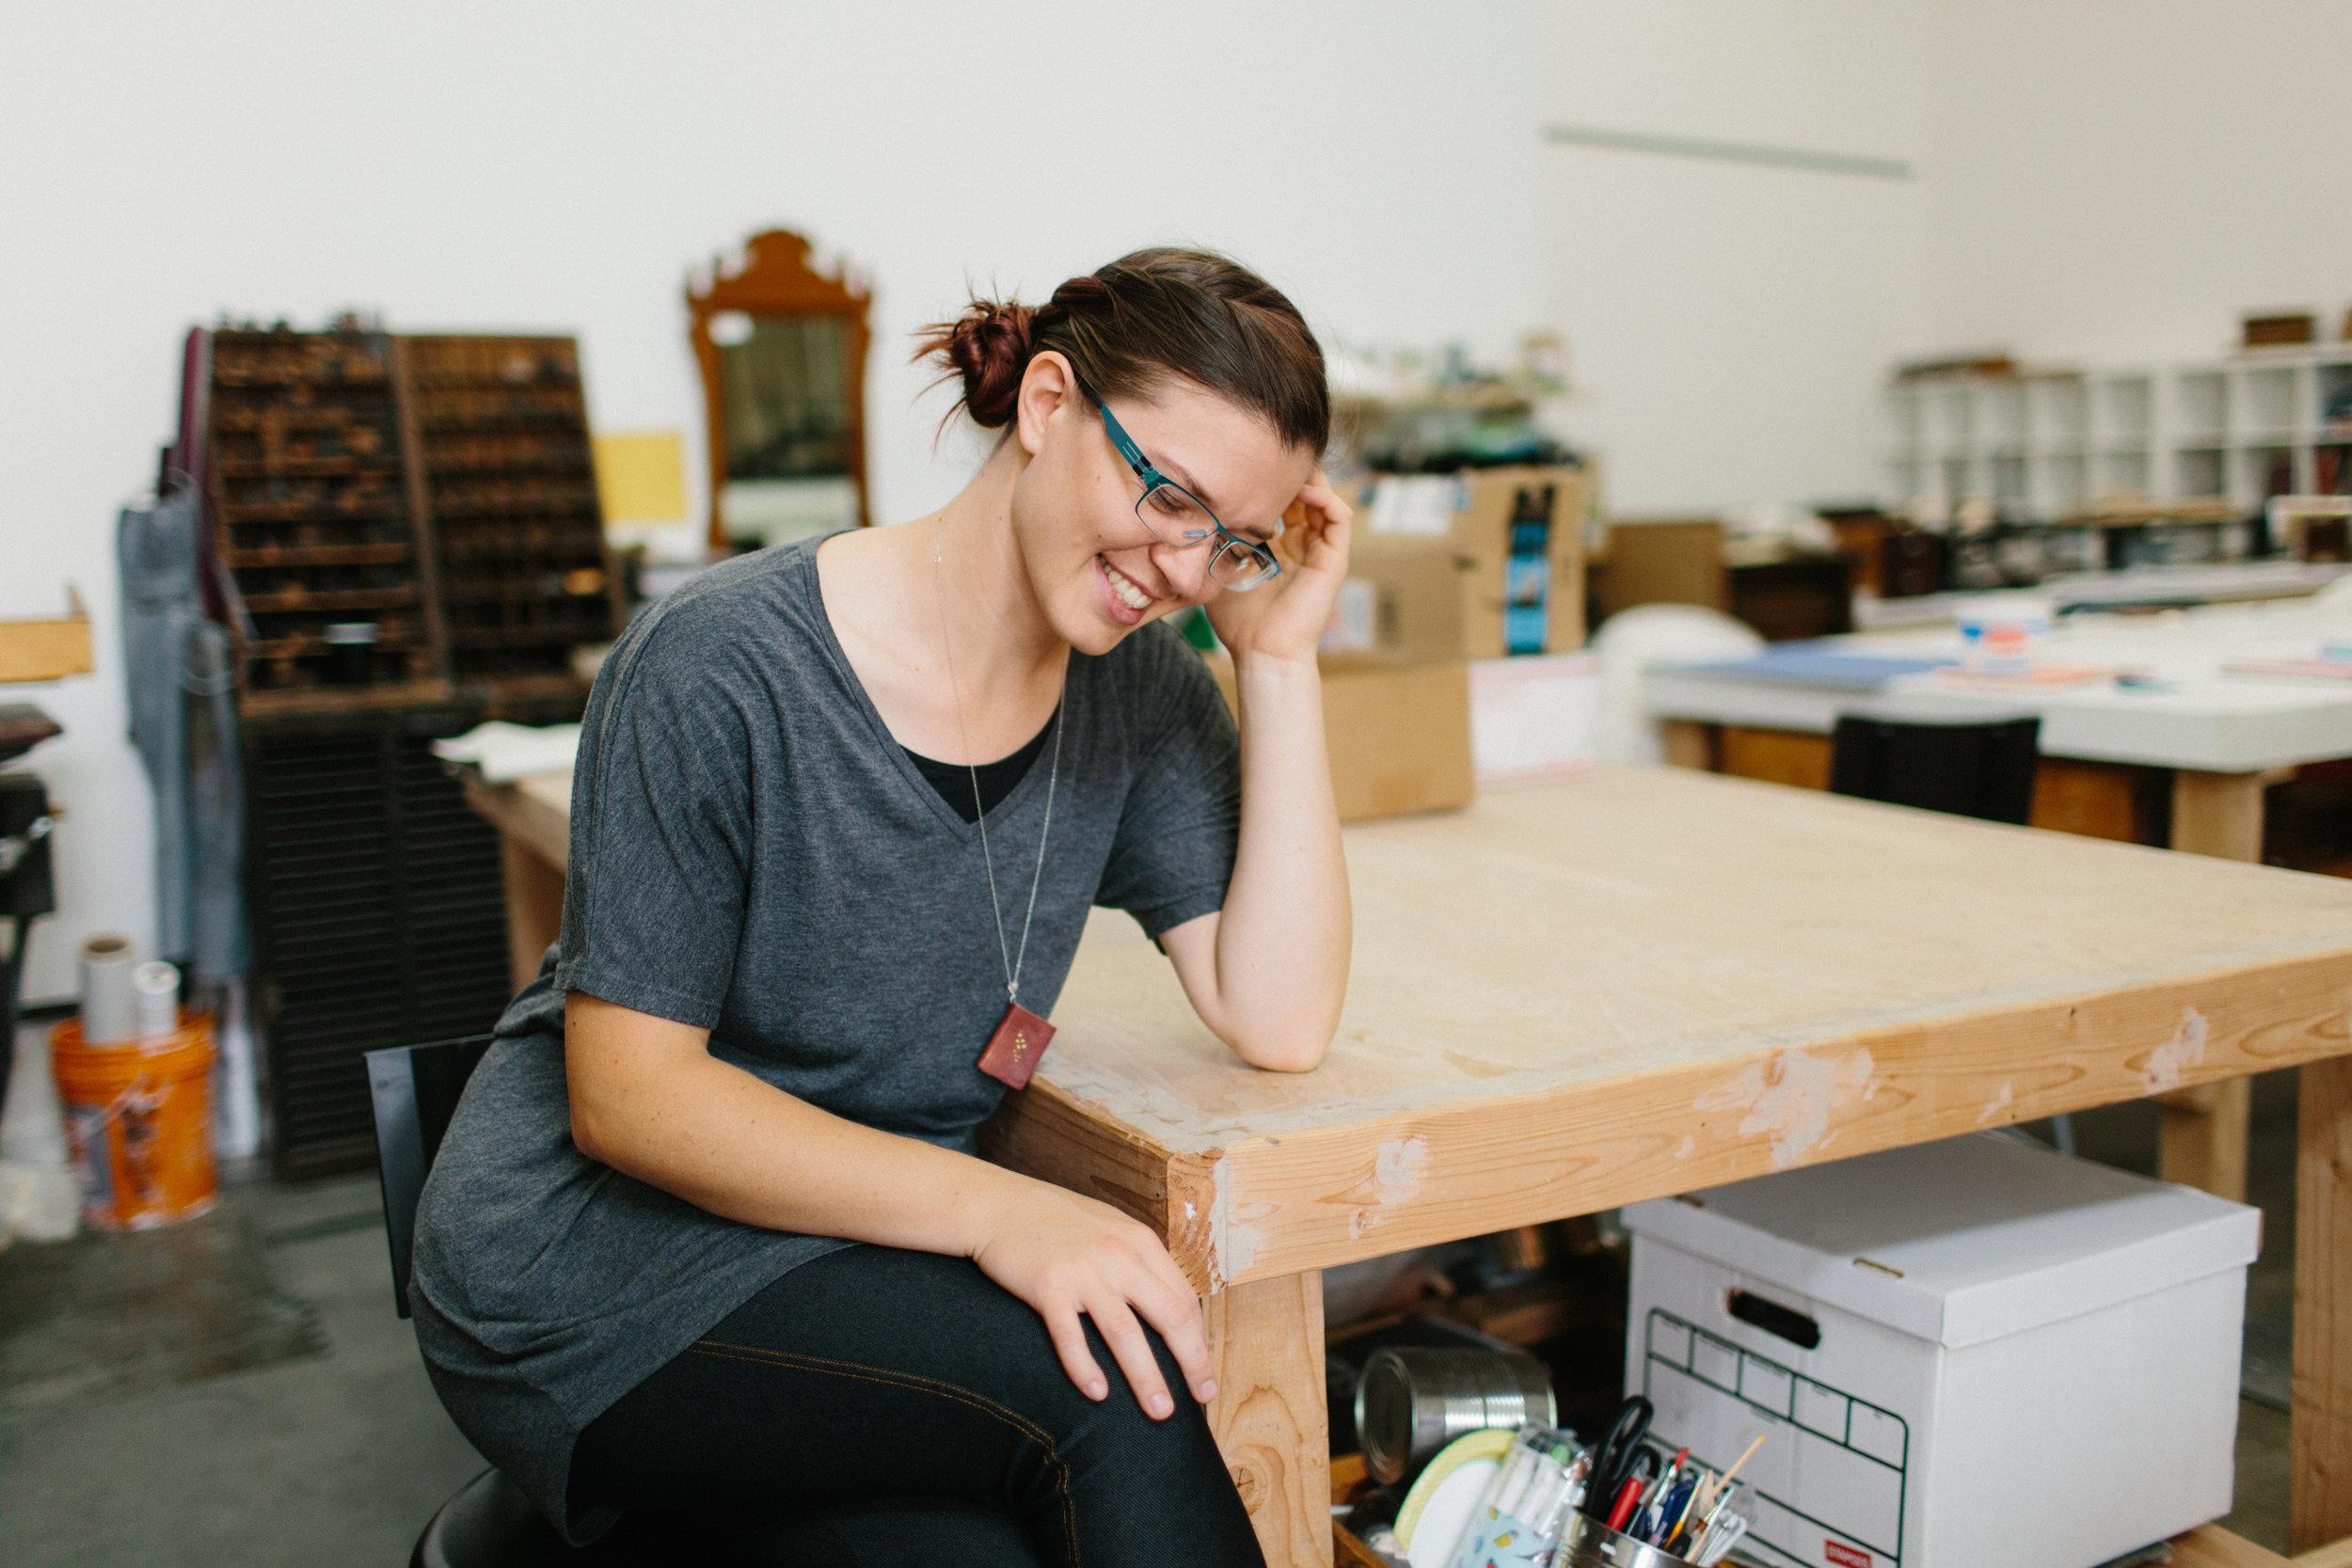 Sarah Mottaghinejad - Book Artist